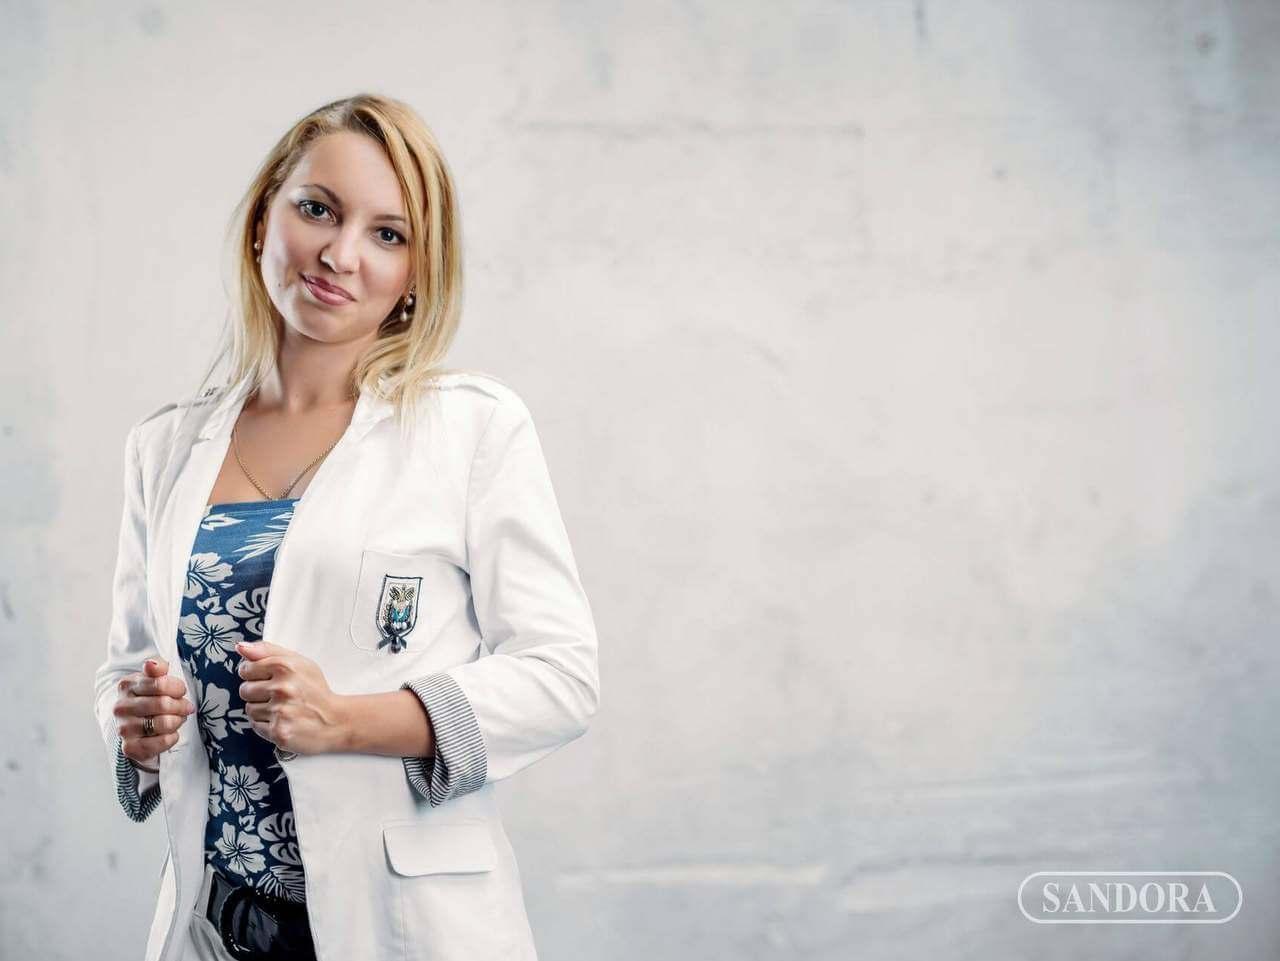 Семенюта Елена Олеговна, врач стоматолог